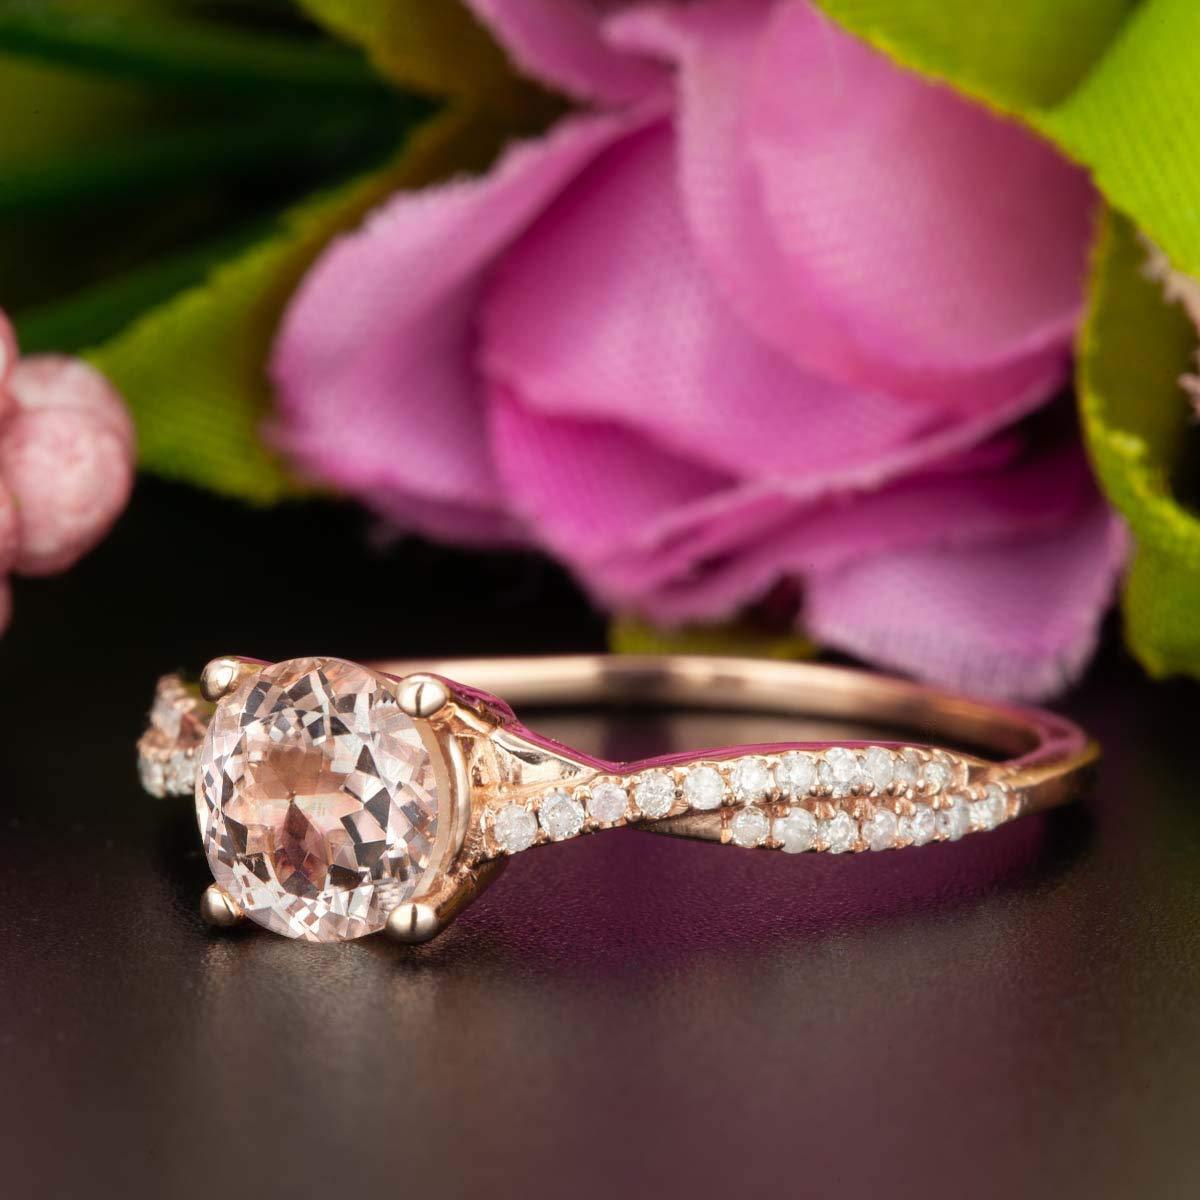 1.25 Carat Round Cut Morganite and Diamond Engagement Ring in Rose Gold Elegant Ring